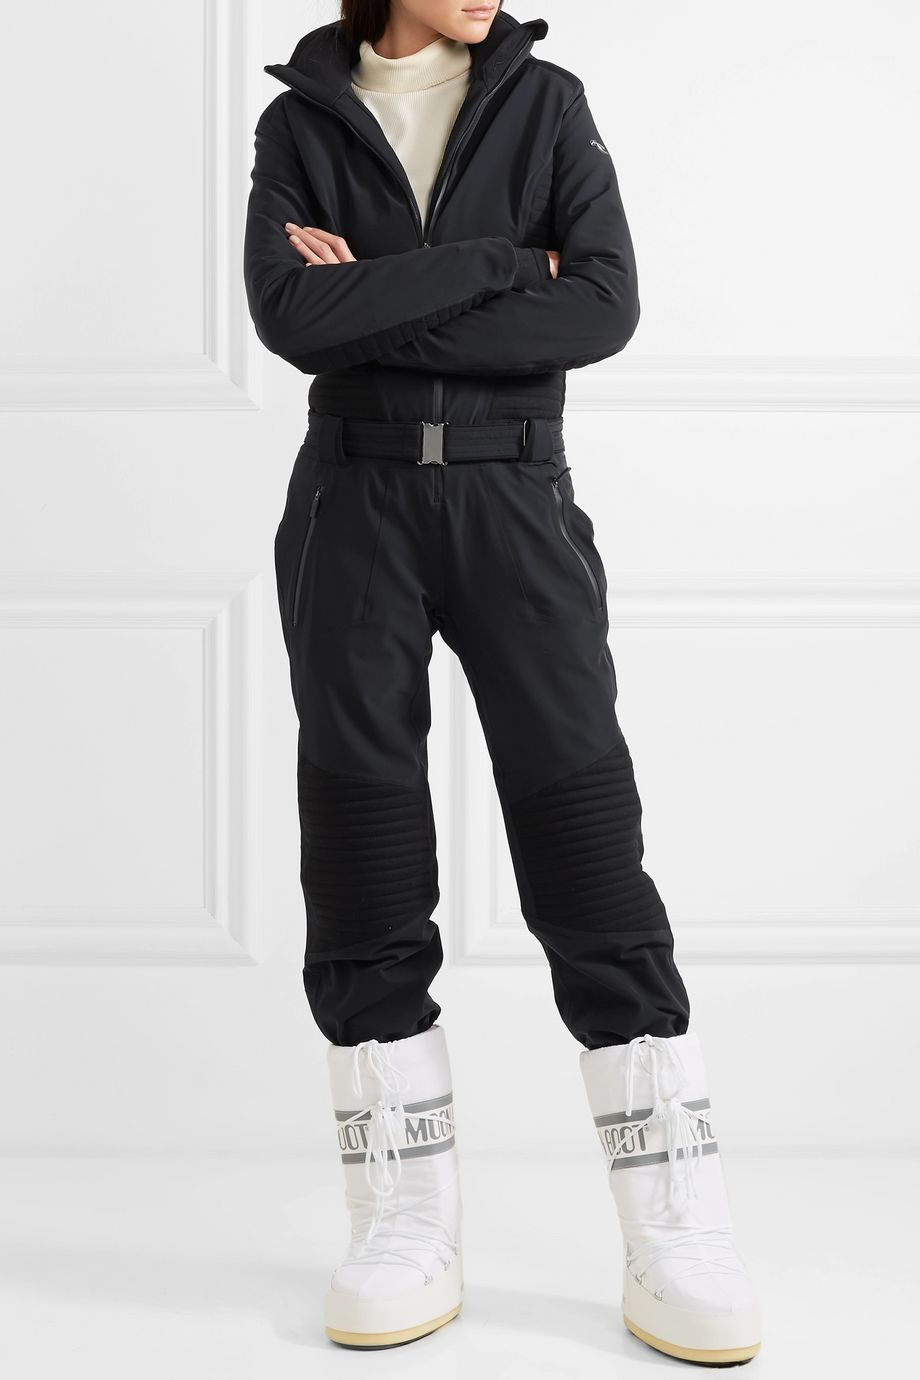 Kjus Sella belted ski suit